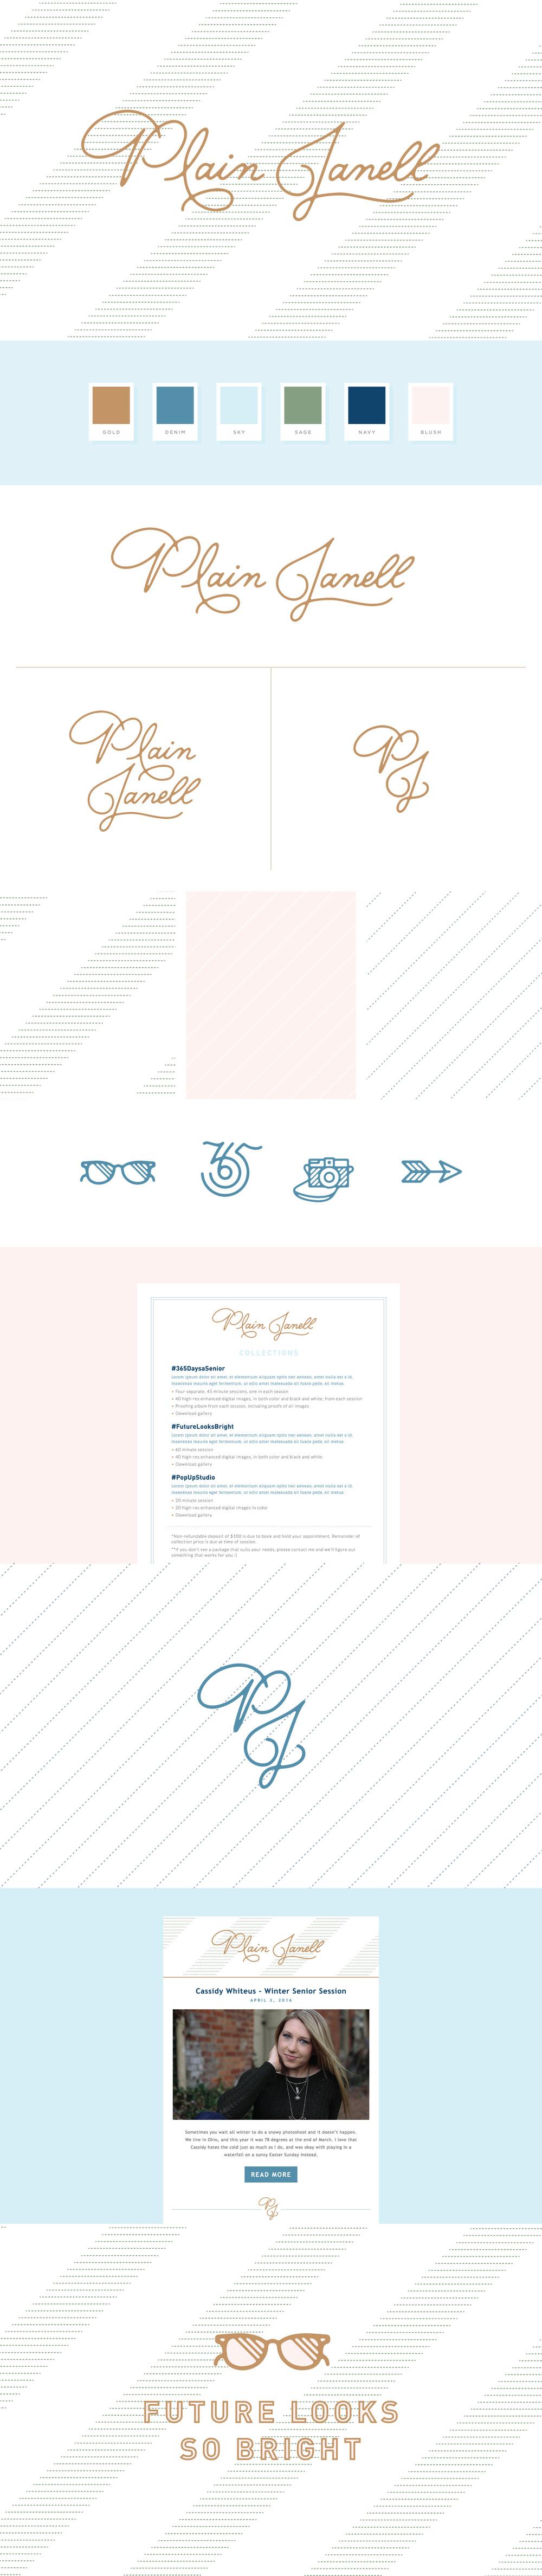 Plain Janell - Logo + Brand Identity Design